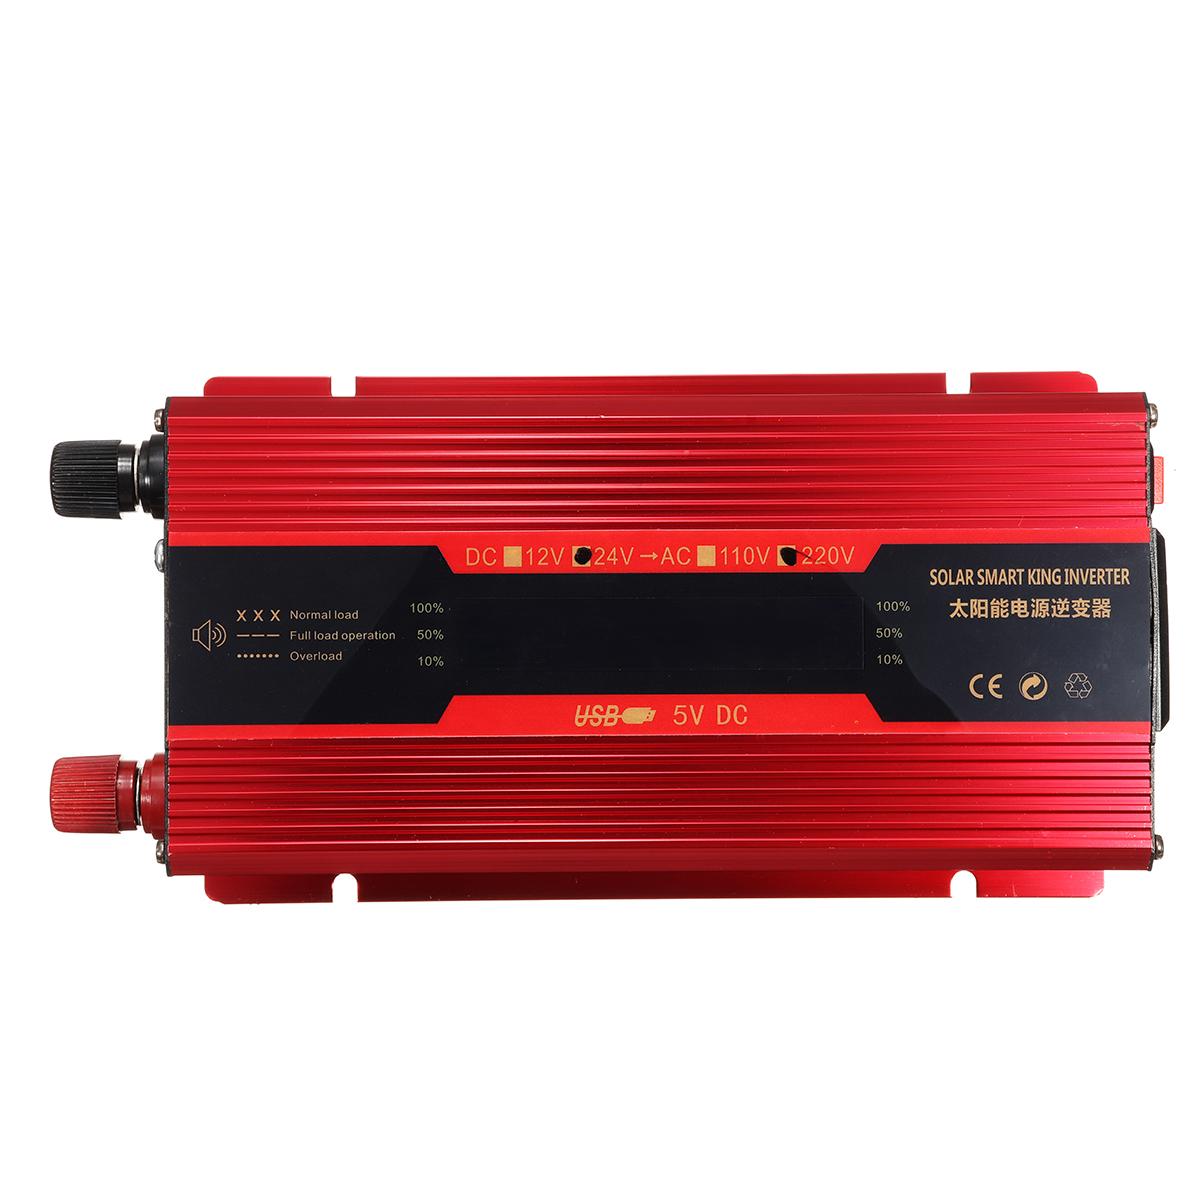 Mocei 3000W/4000W/5000W Solar Power Inverter DC12/24V to AC110V/220V Sine Wave Convert 12V-220V 4000w Car Electronics Accessories Car Electronics & Accessories